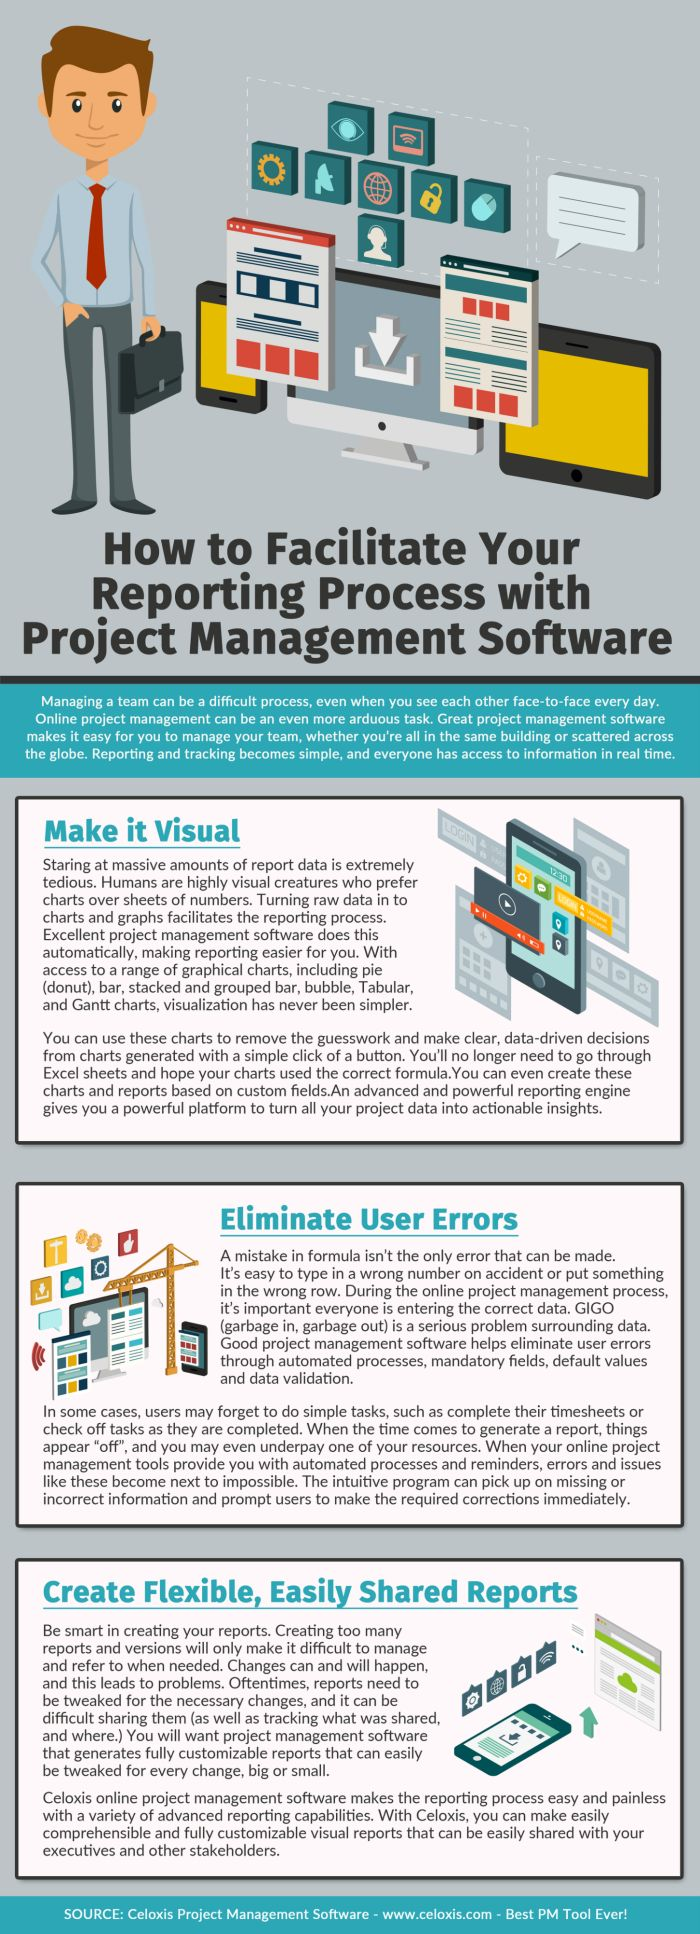 33 best Project management images on Pinterest | Infographic ...